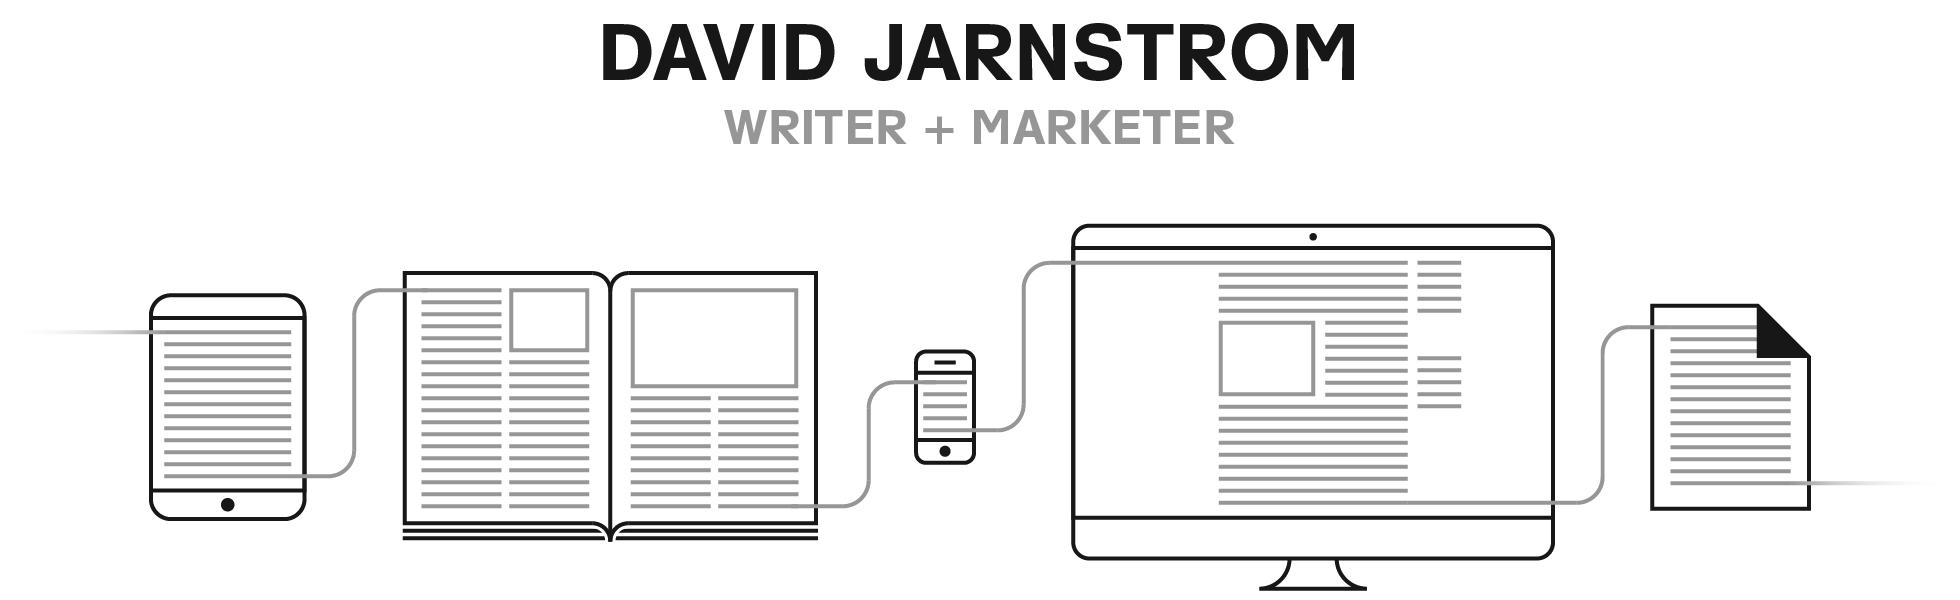 David Jarnstrom